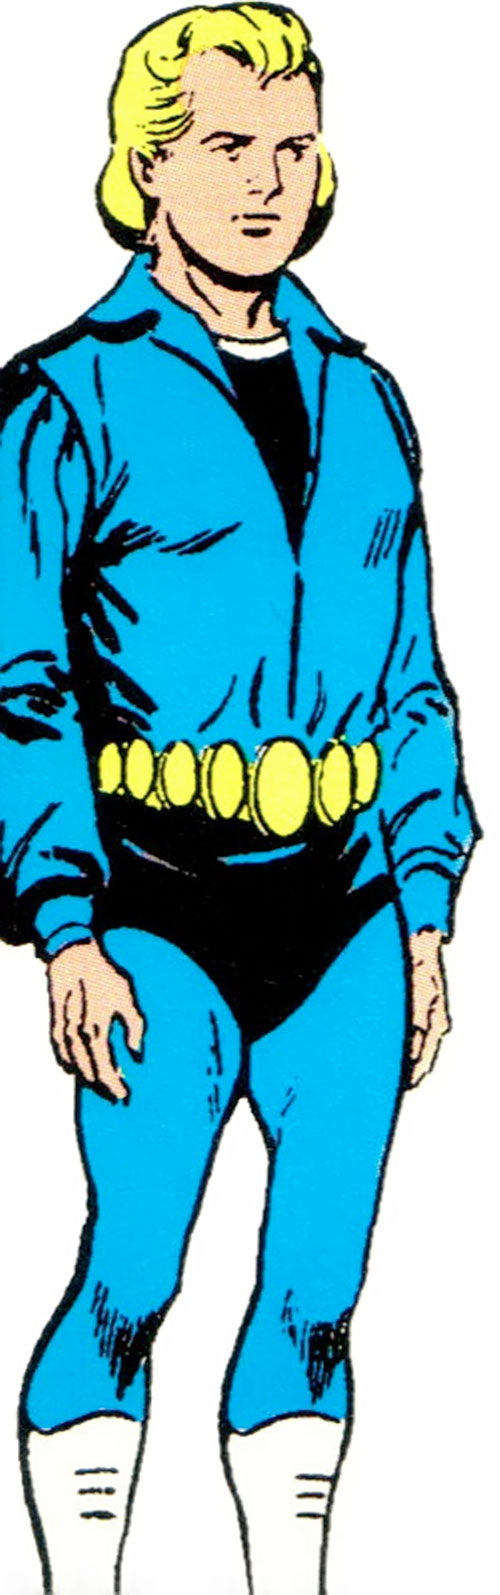 Animal Lad (Legion of Super-Heroes character) (DC Comics)